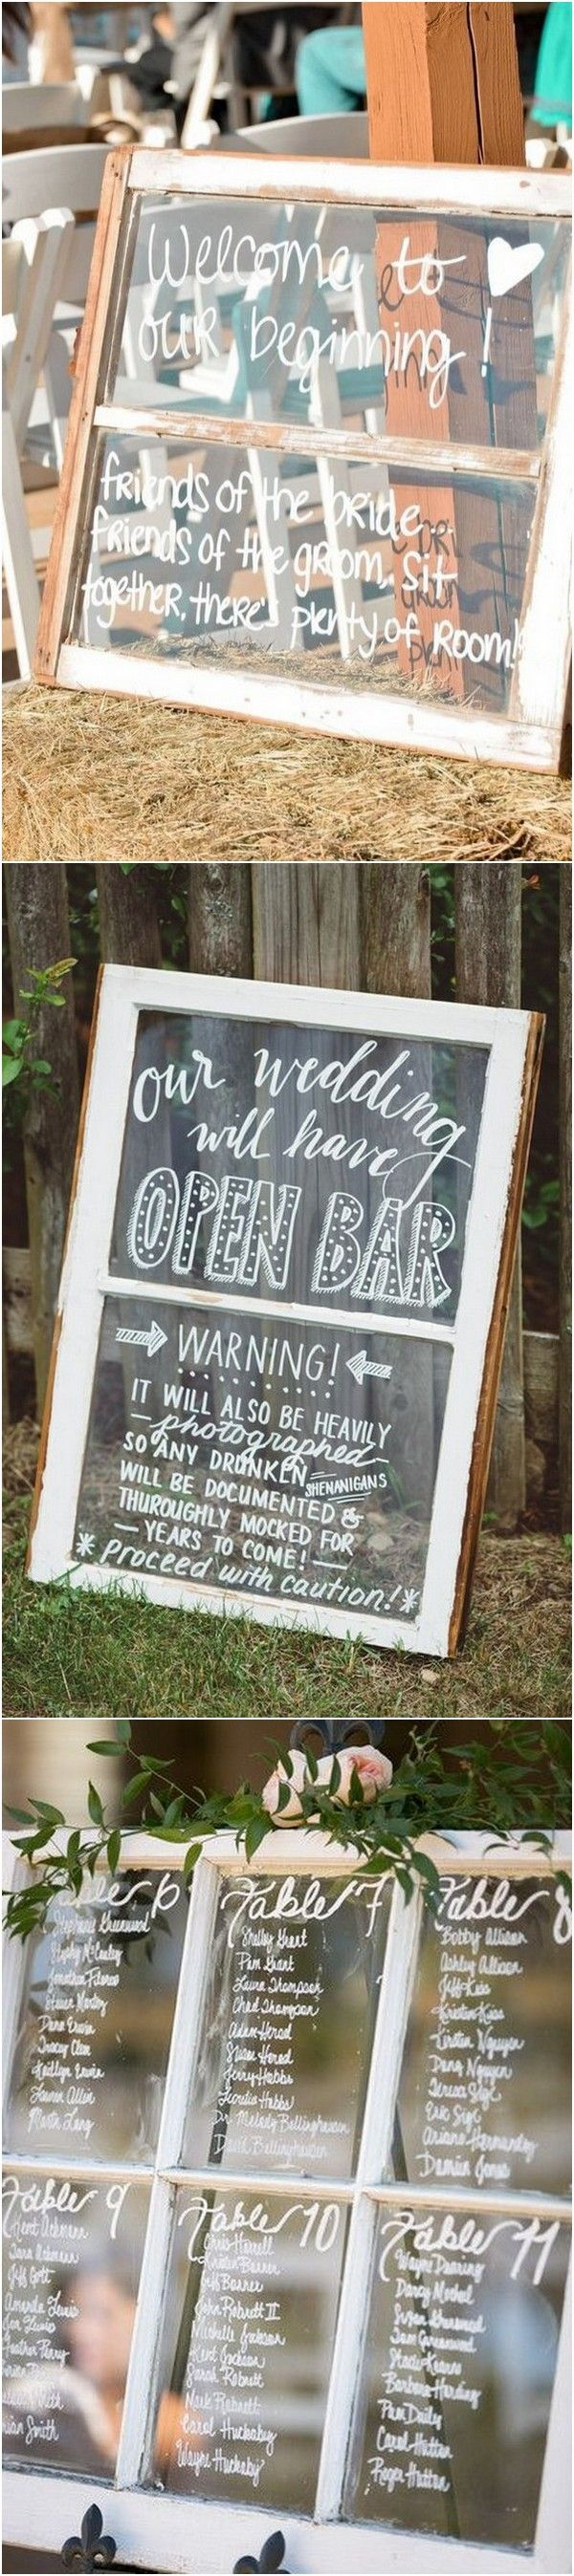 Diy vintage wedding decoration ideas   DIY Wedding Decoration Ideas with Vintage Windows in